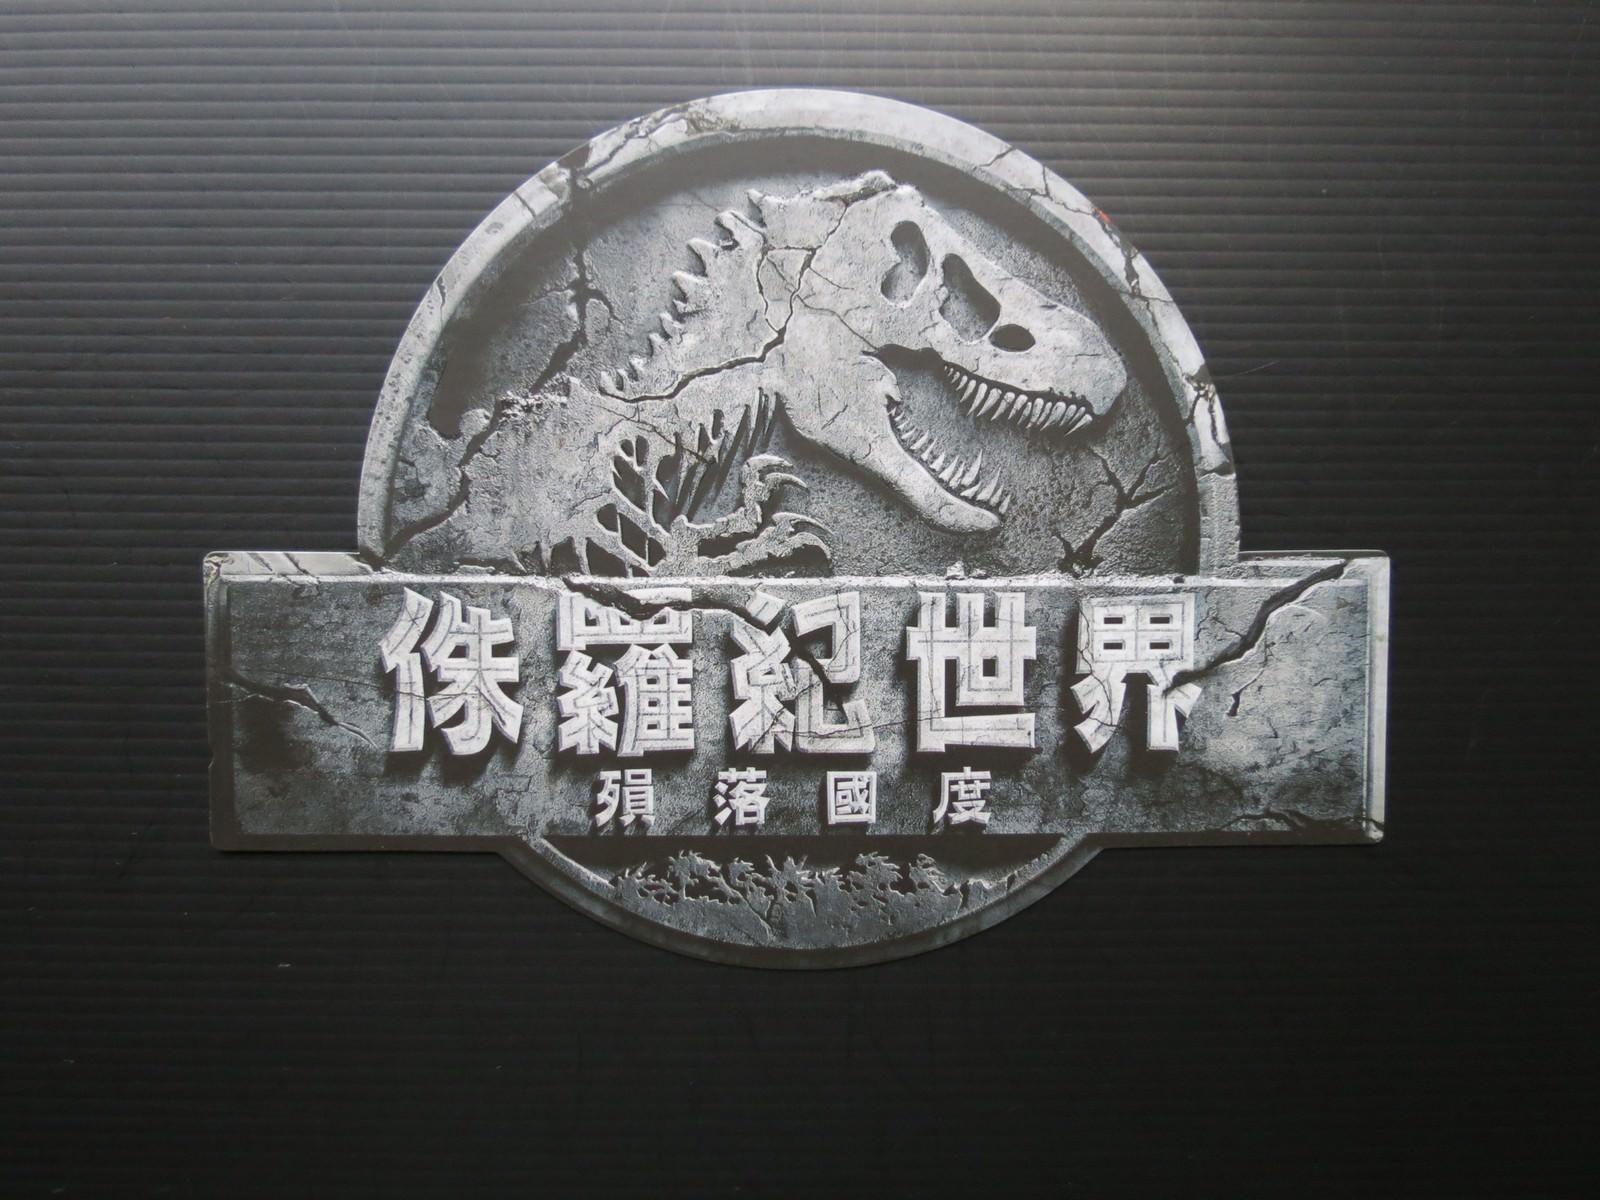 Movie, Jurassic World: Fallen Kingdom(美國) / 侏羅紀世界:殞落國度(台) / 侏罗纪世界2(中) / 侏羅紀世界:迷失國度(港), 特映會